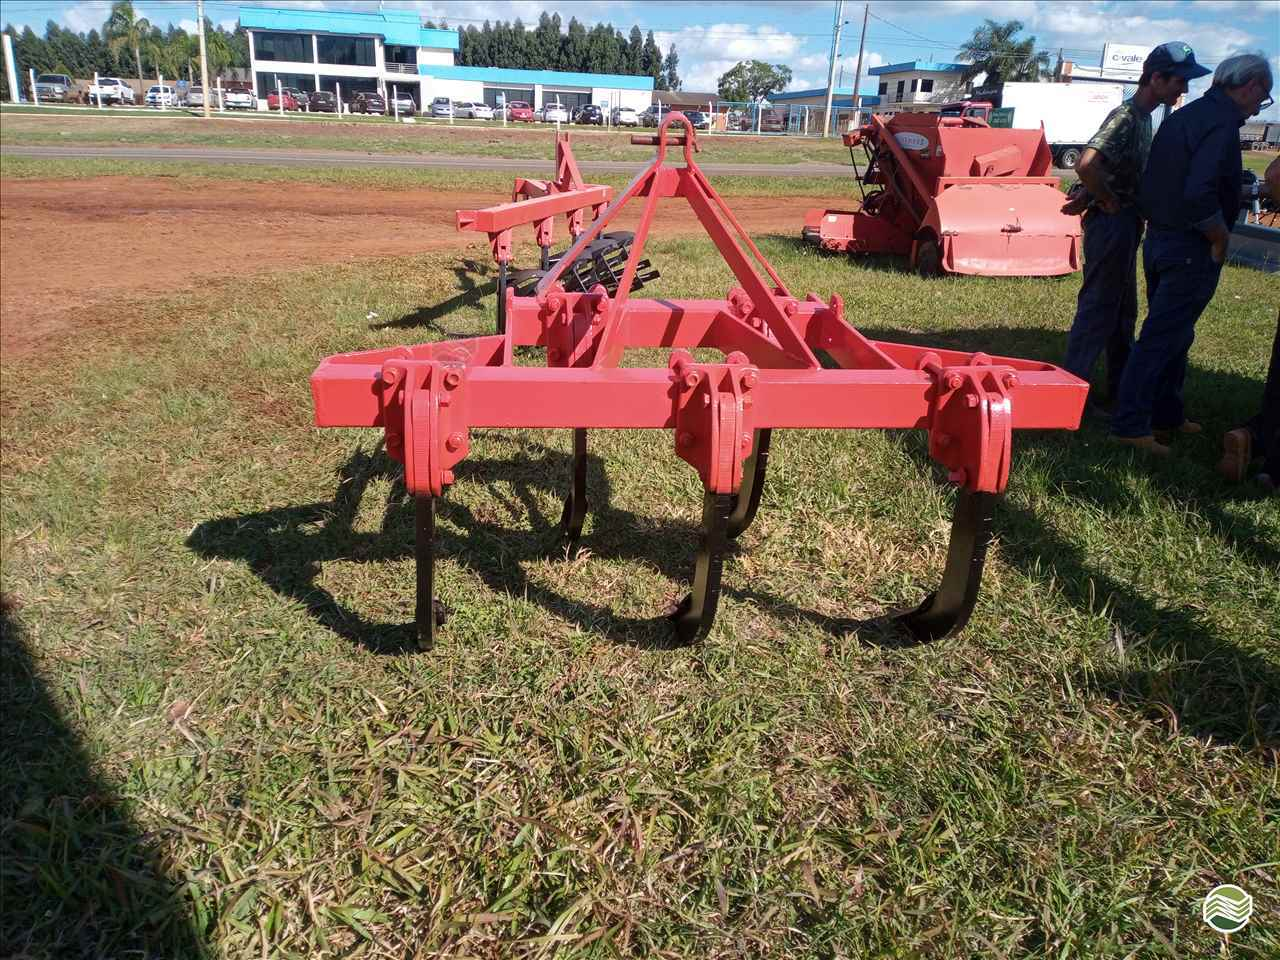 IMPLEMENTOS AGRICOLAS SUBSOLADOR 5 HASTES Starmaq Implementos Agrícolas CRUZ ALTA RIO GRANDE DO SUL RS